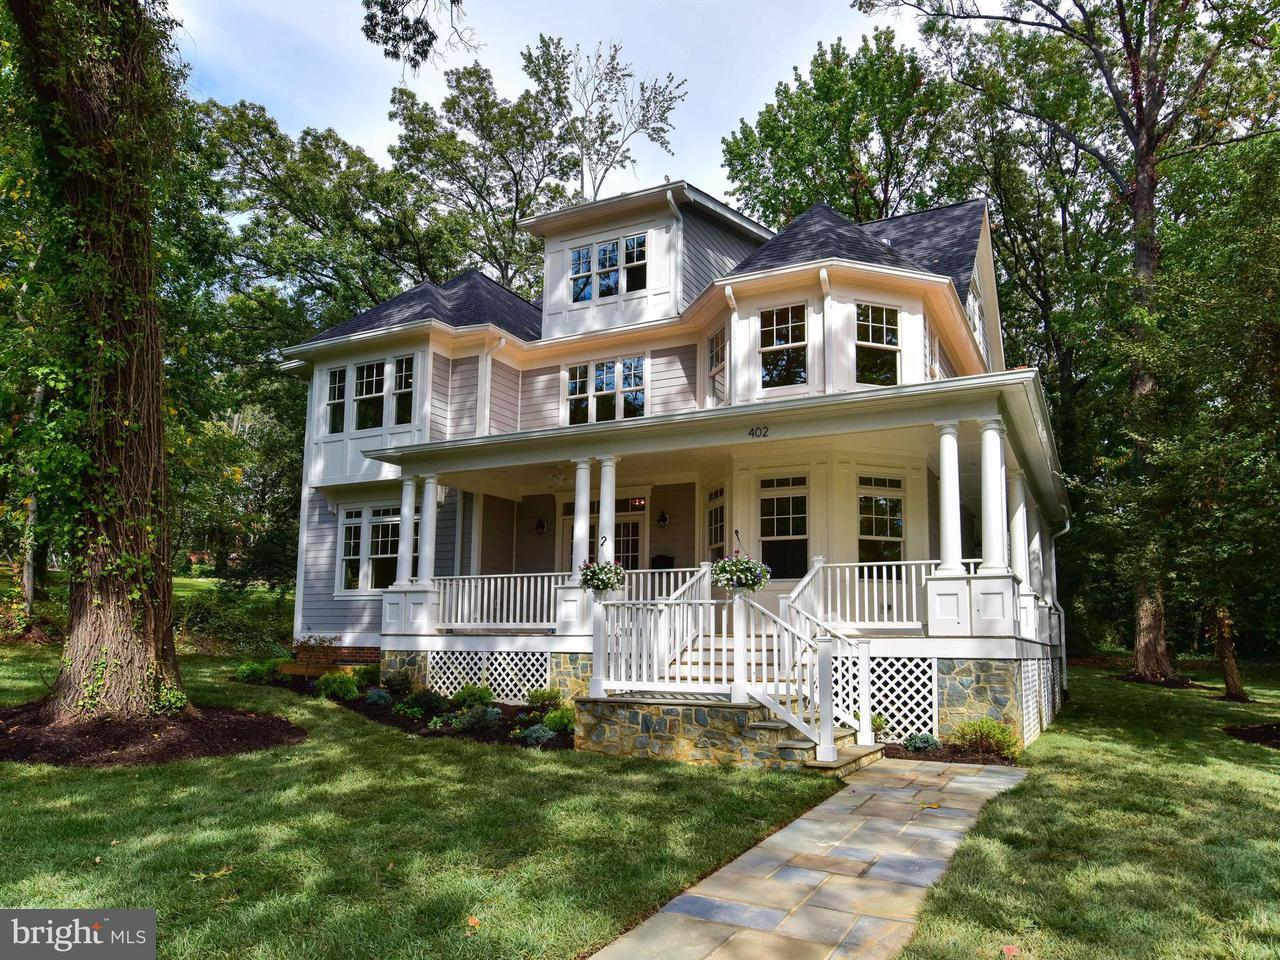 Single Family for Sale at 402 Princeton Blvd Alexandria, Virginia 22314 United States